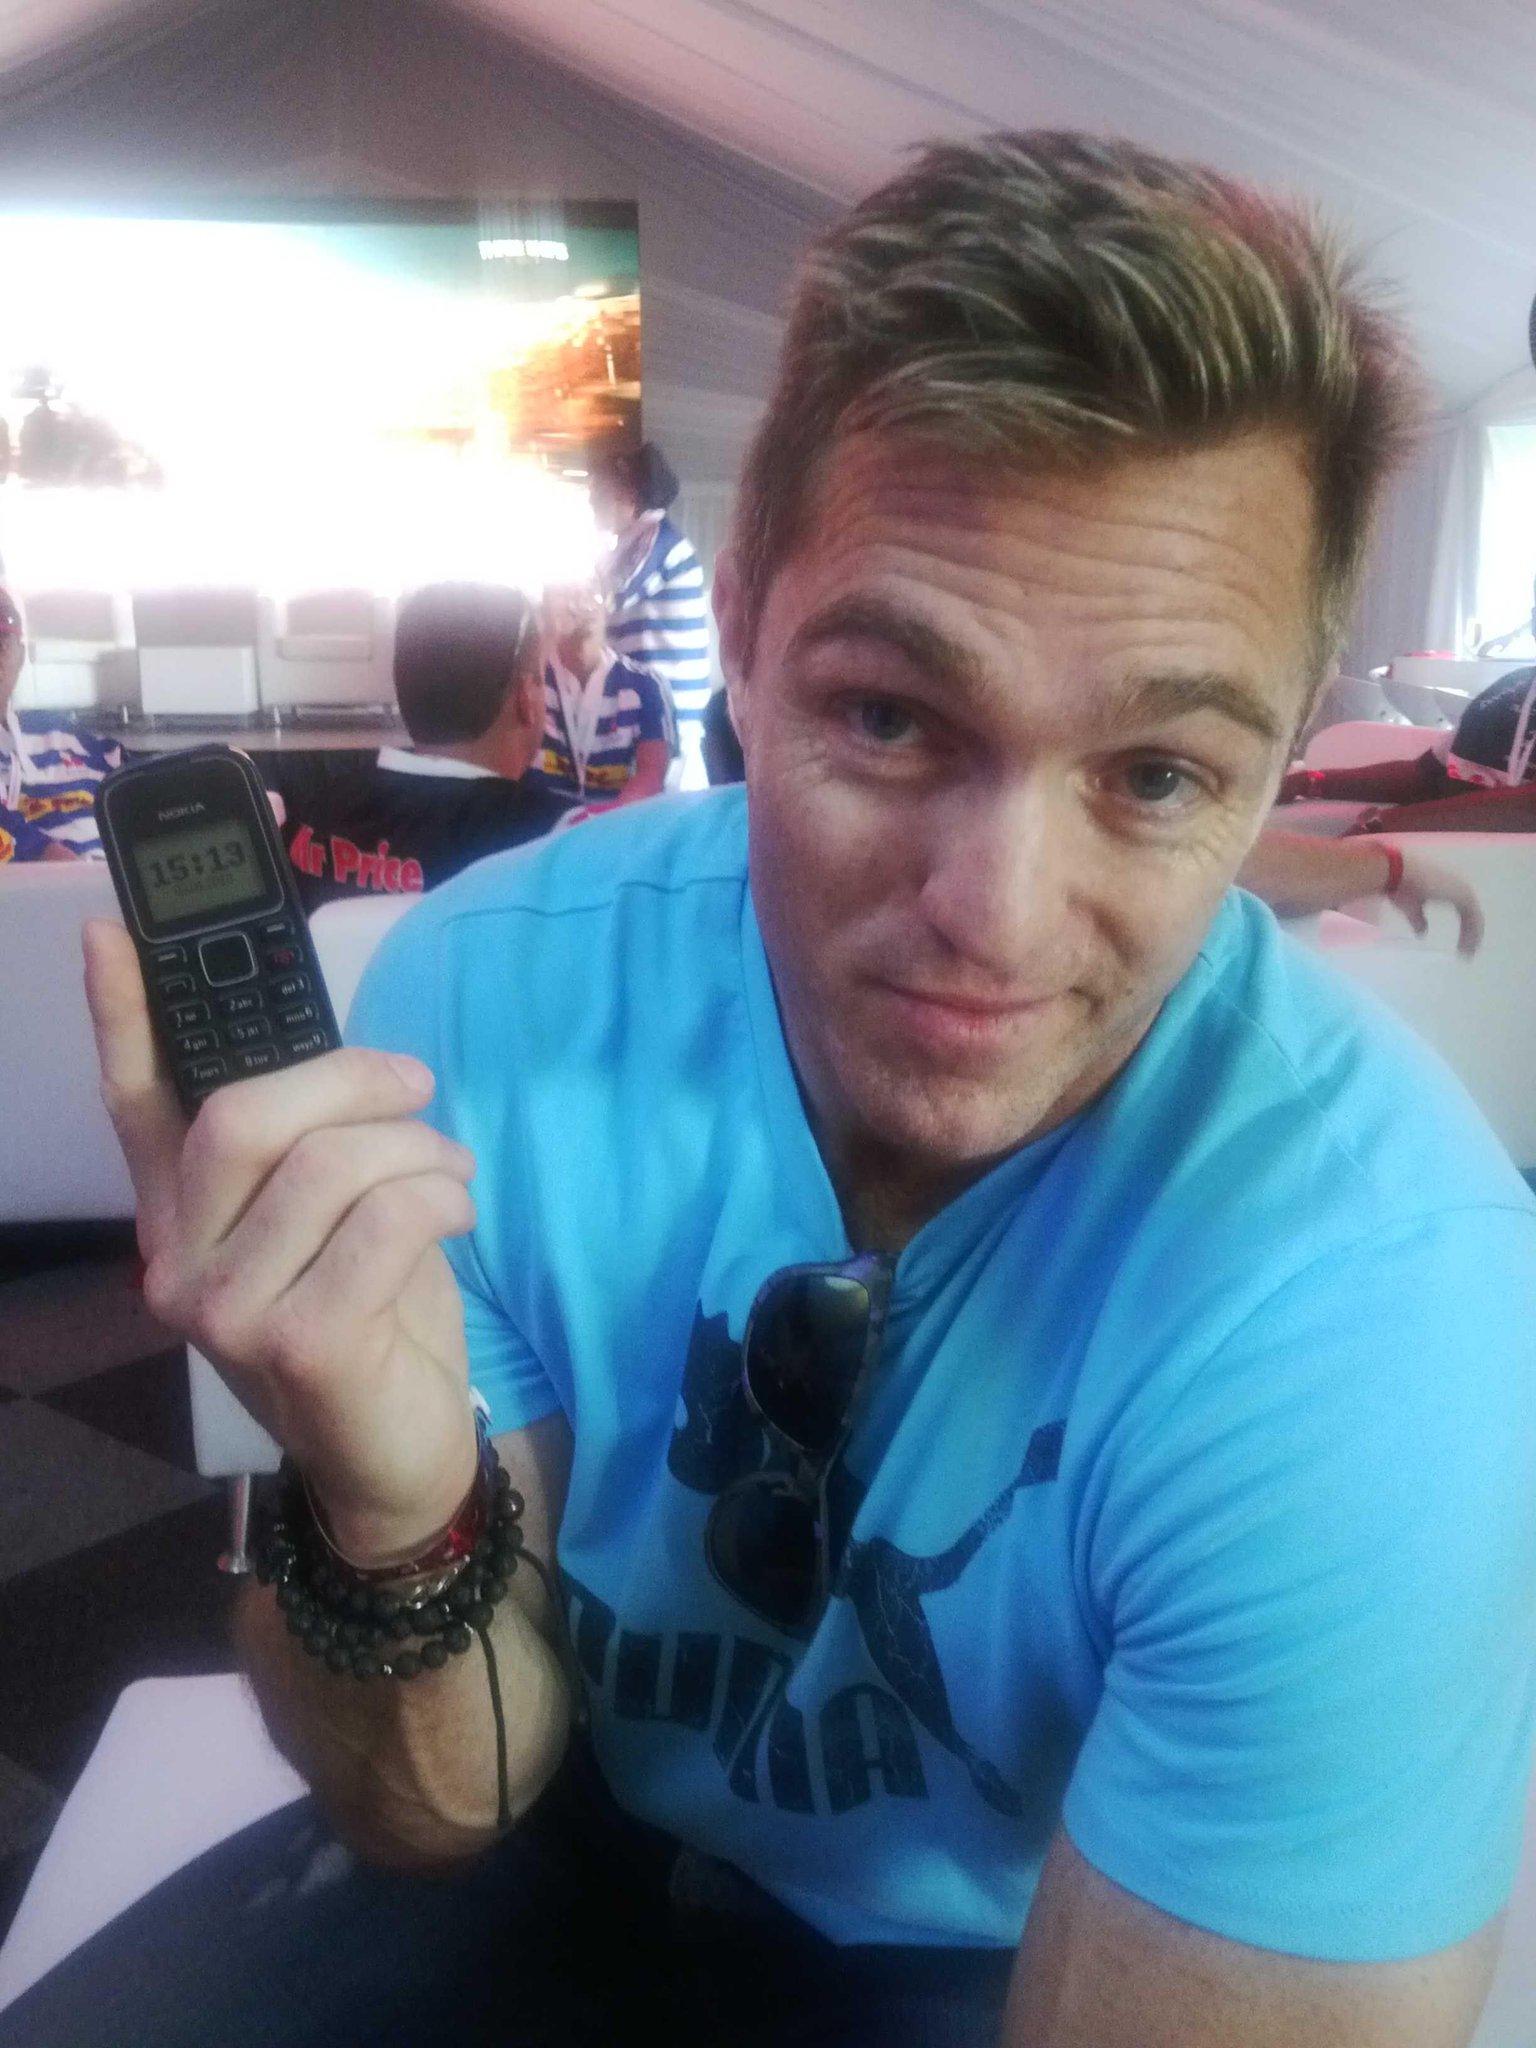 RT @dannicholl: The techno-savvy @Monty15Monty with his new smart 'phone. @BobSkinstad @JohnSmit123 @toksvdl http://t.co/G188ce5wdj